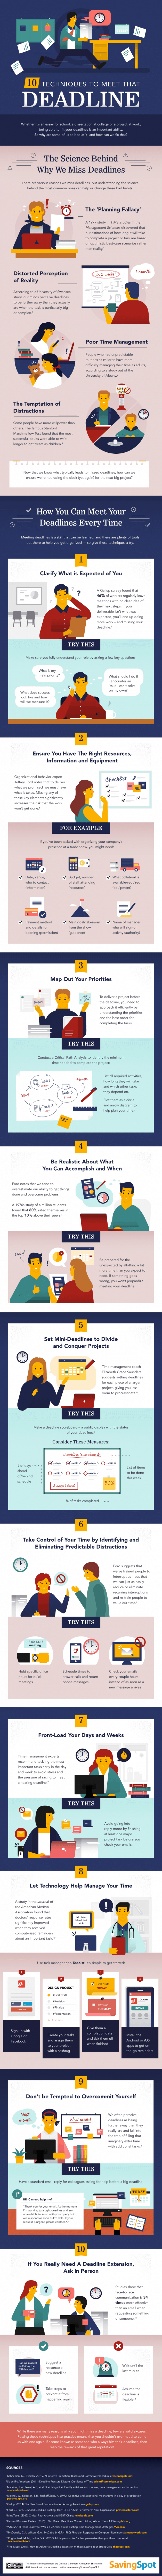 How to Meet every deadline